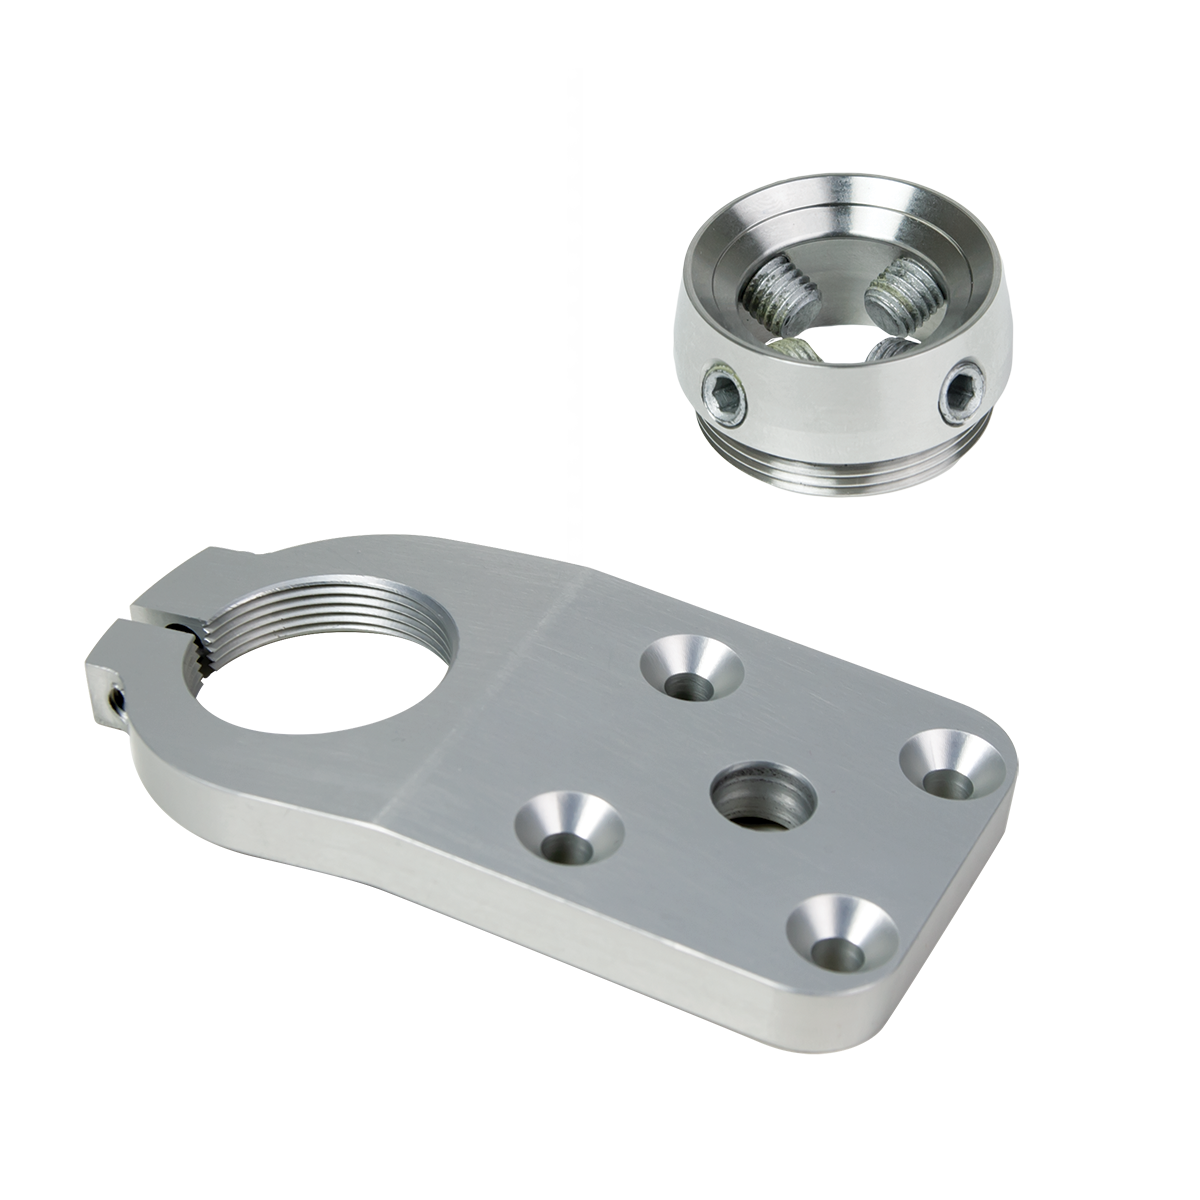 4-Hole Threaded FP, 10 deg, w/ Receiver, Rotatable, Ti